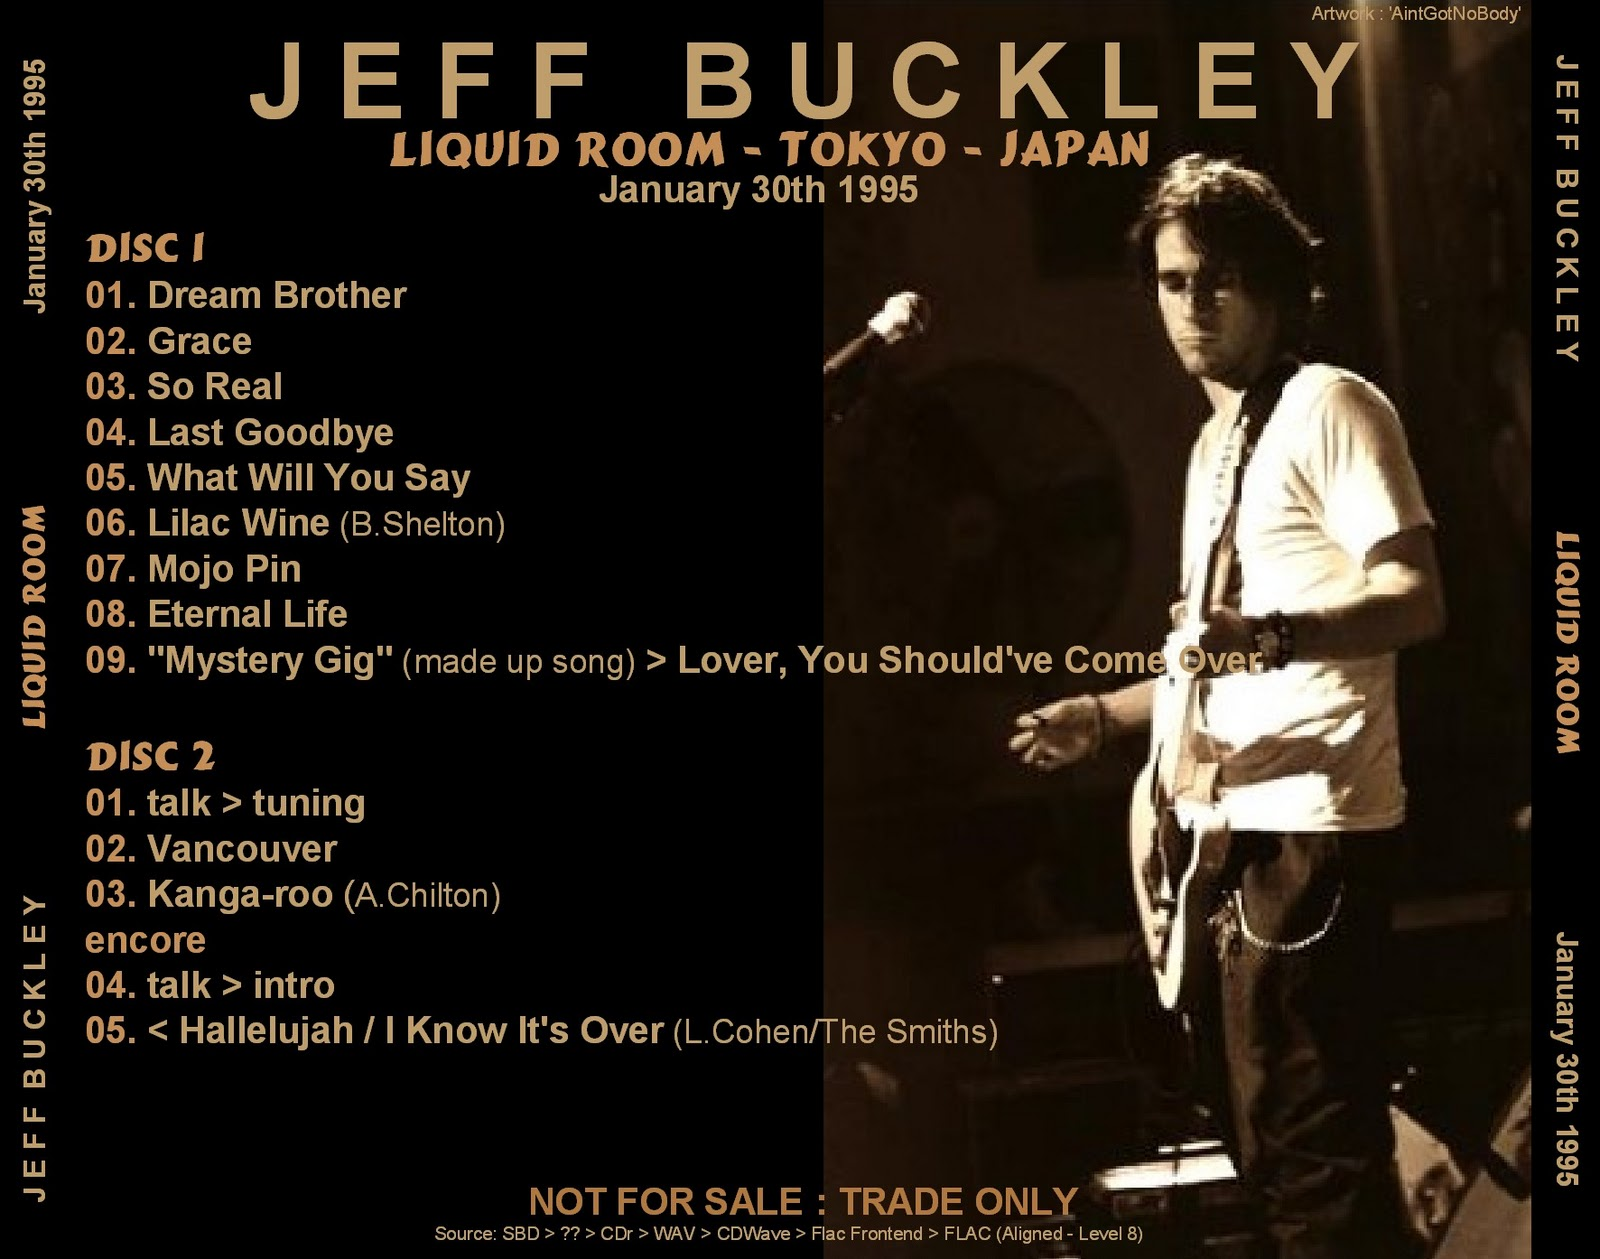 Plumdusty 39 S Page Jeff Buckley 1995 01 30 Liquid Room Tokyo Japan